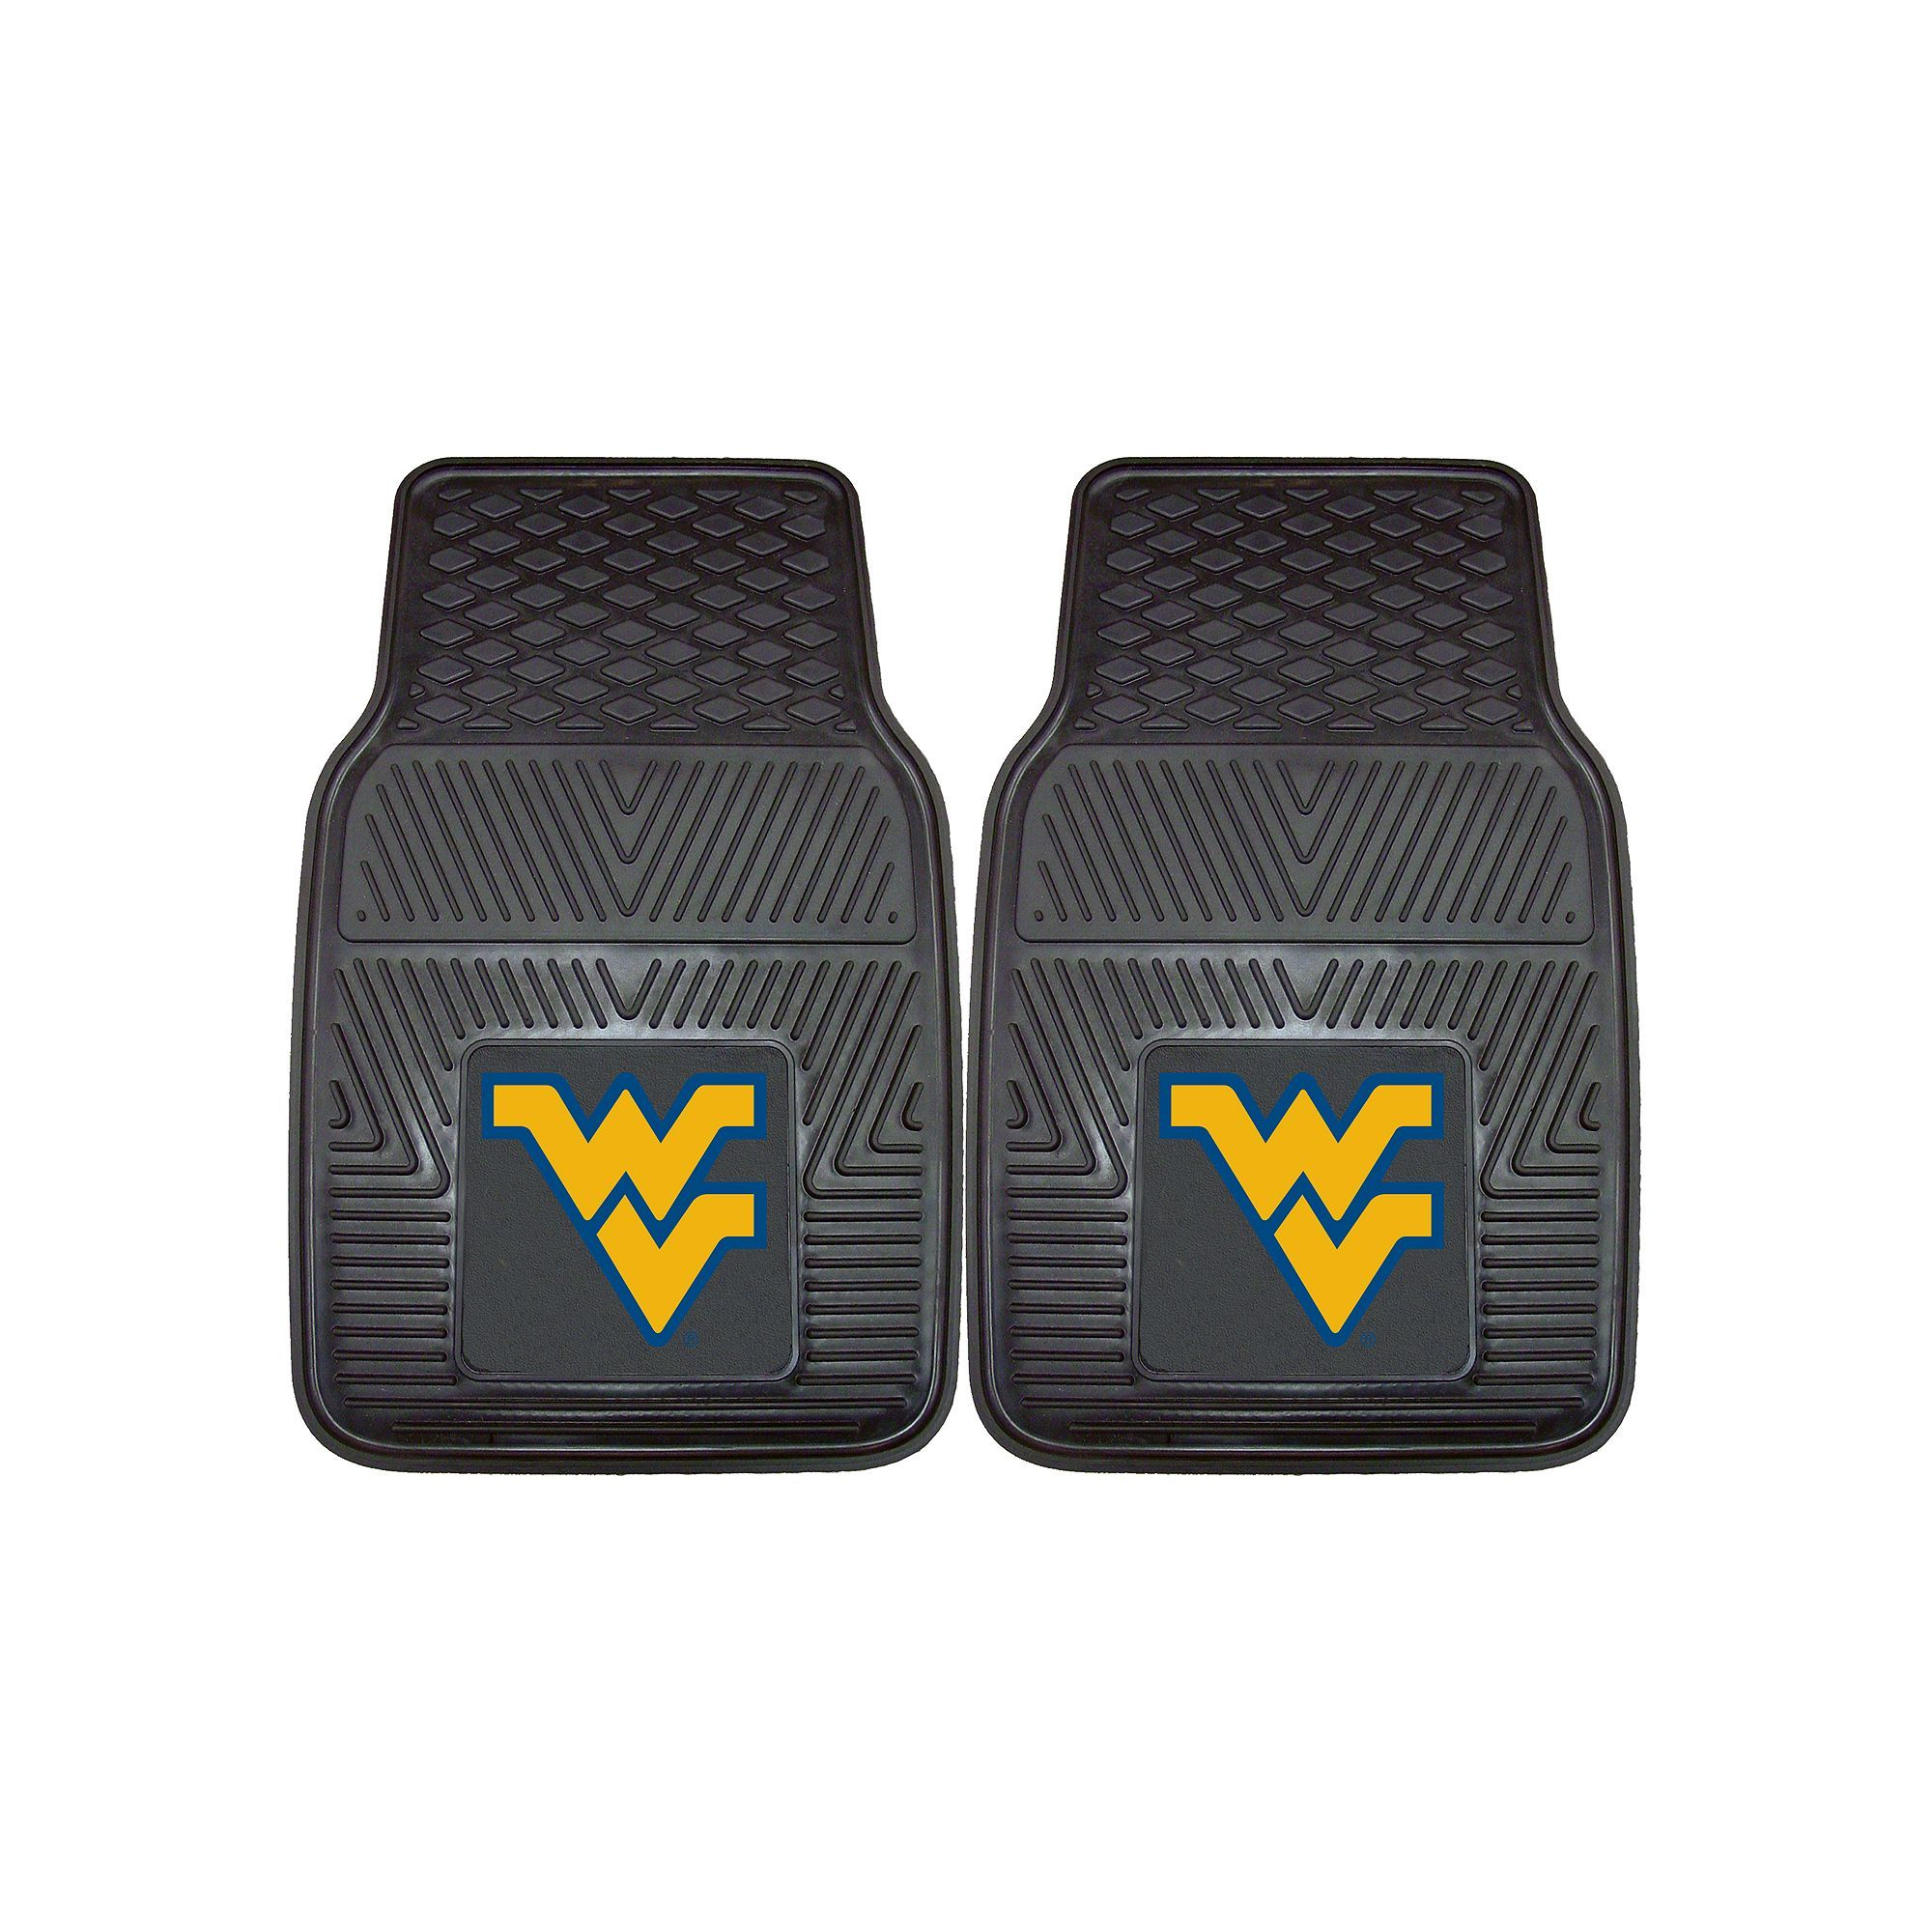 Fanmats 2-pk. West Virginia Mountaineers Car Floor Mats, Multicolor